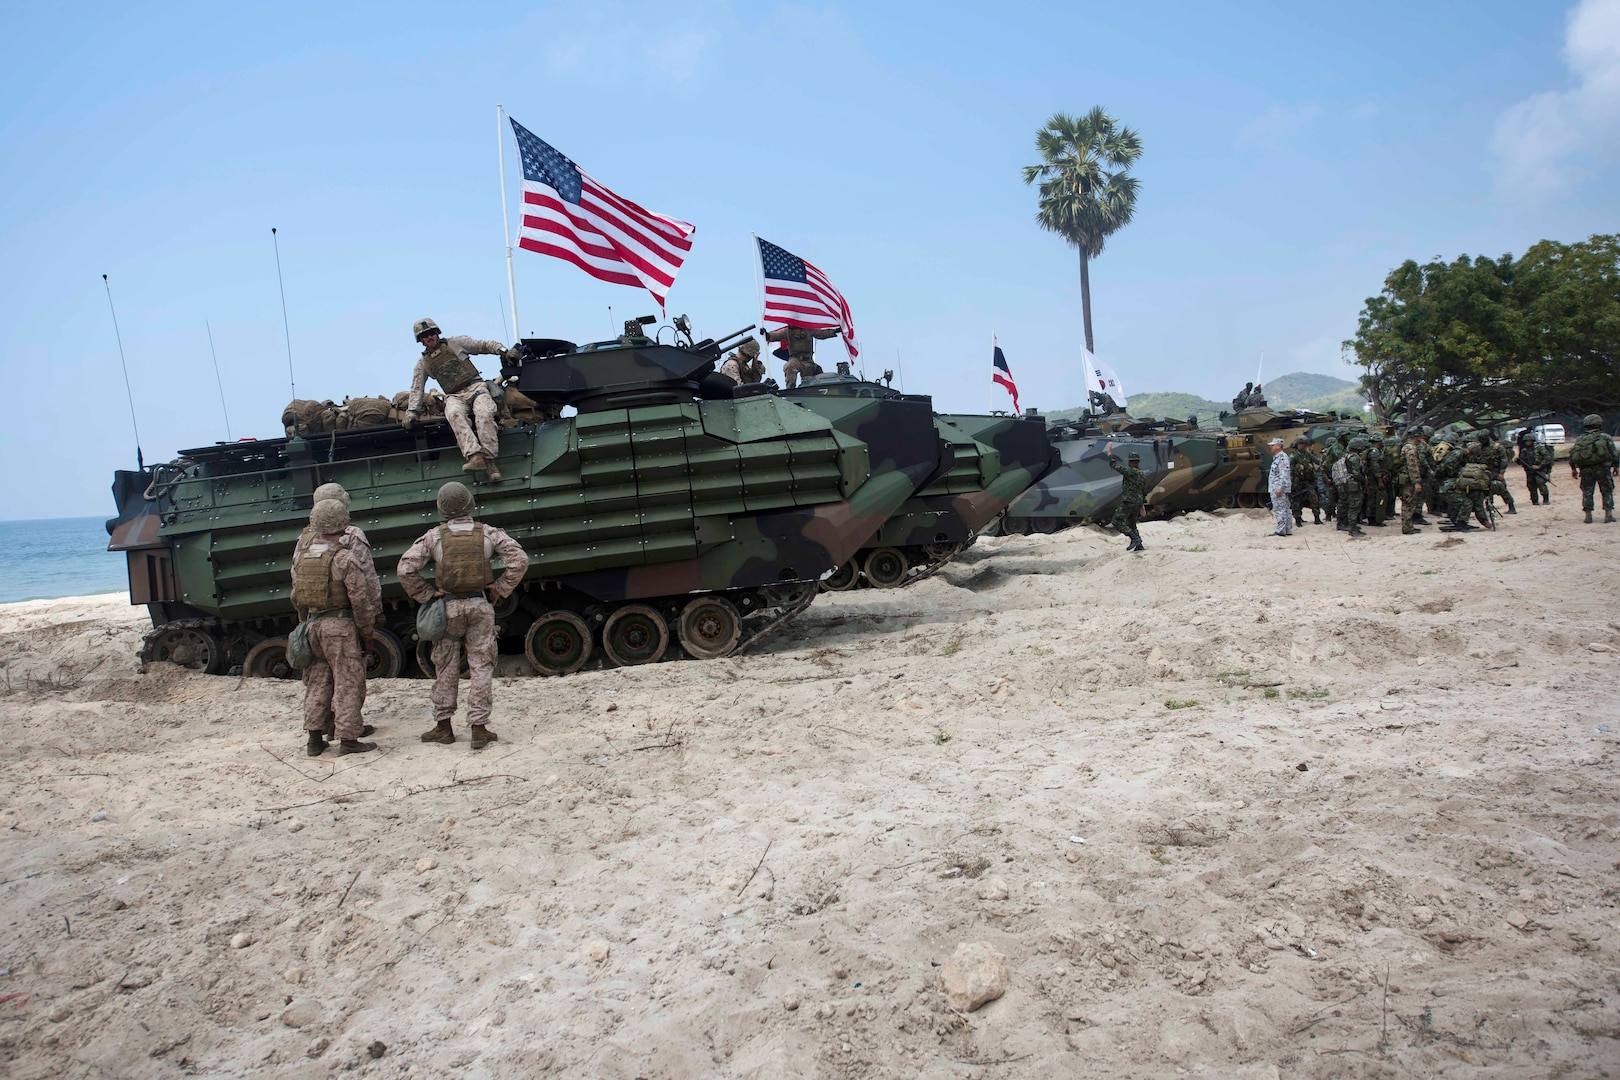 U.S., South Korean and Thai Marines position their assault amphibious vehicles after conducting an amphibious assault.